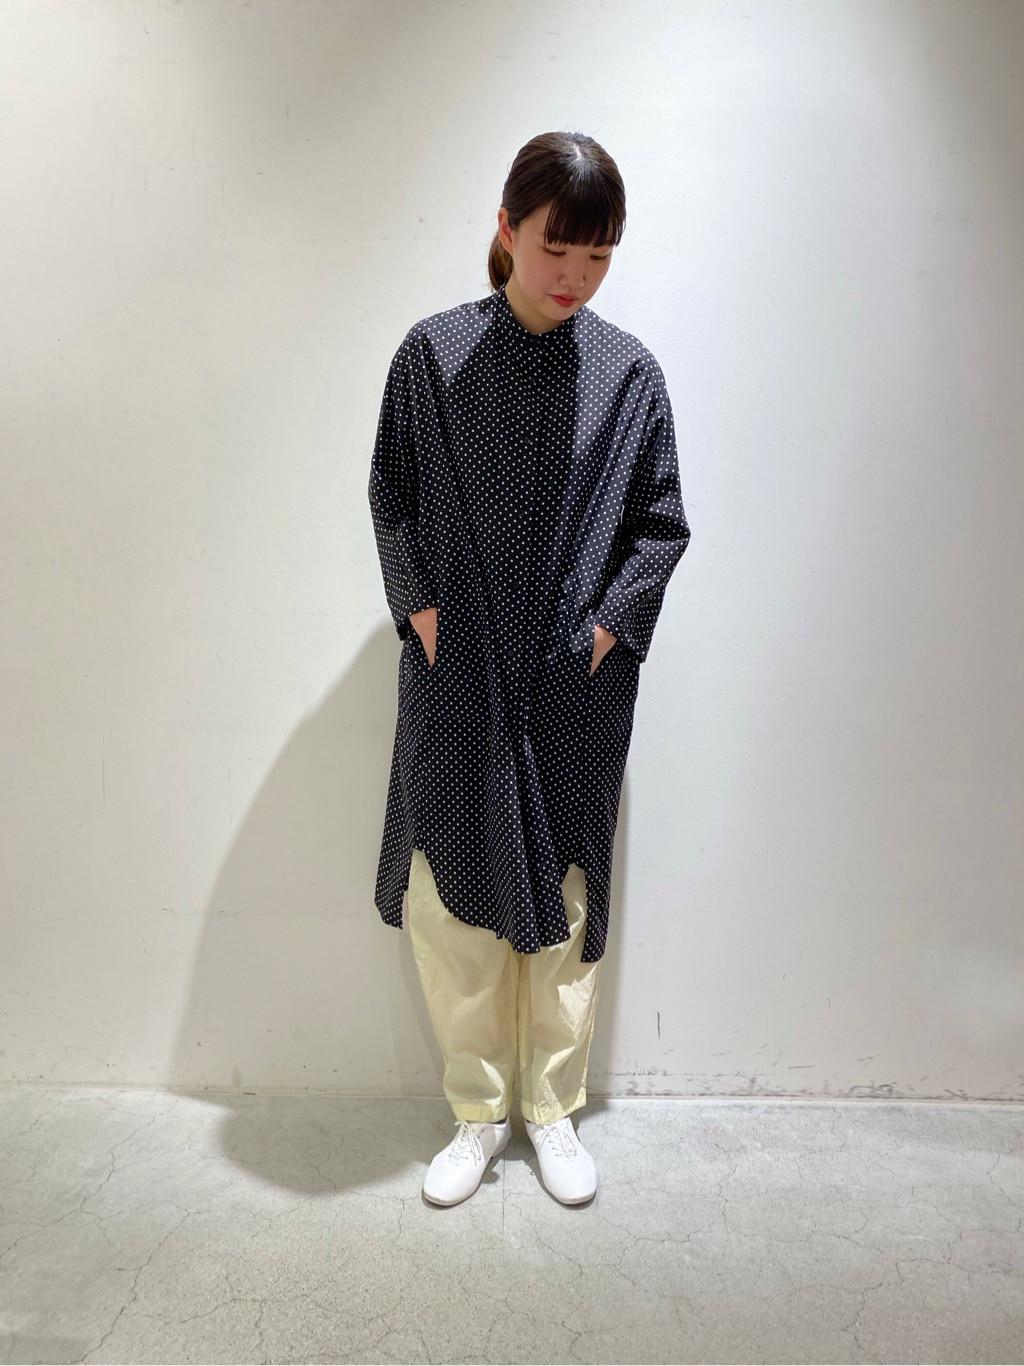 yuni 神戸路面 身長:166cm 2021.03.07